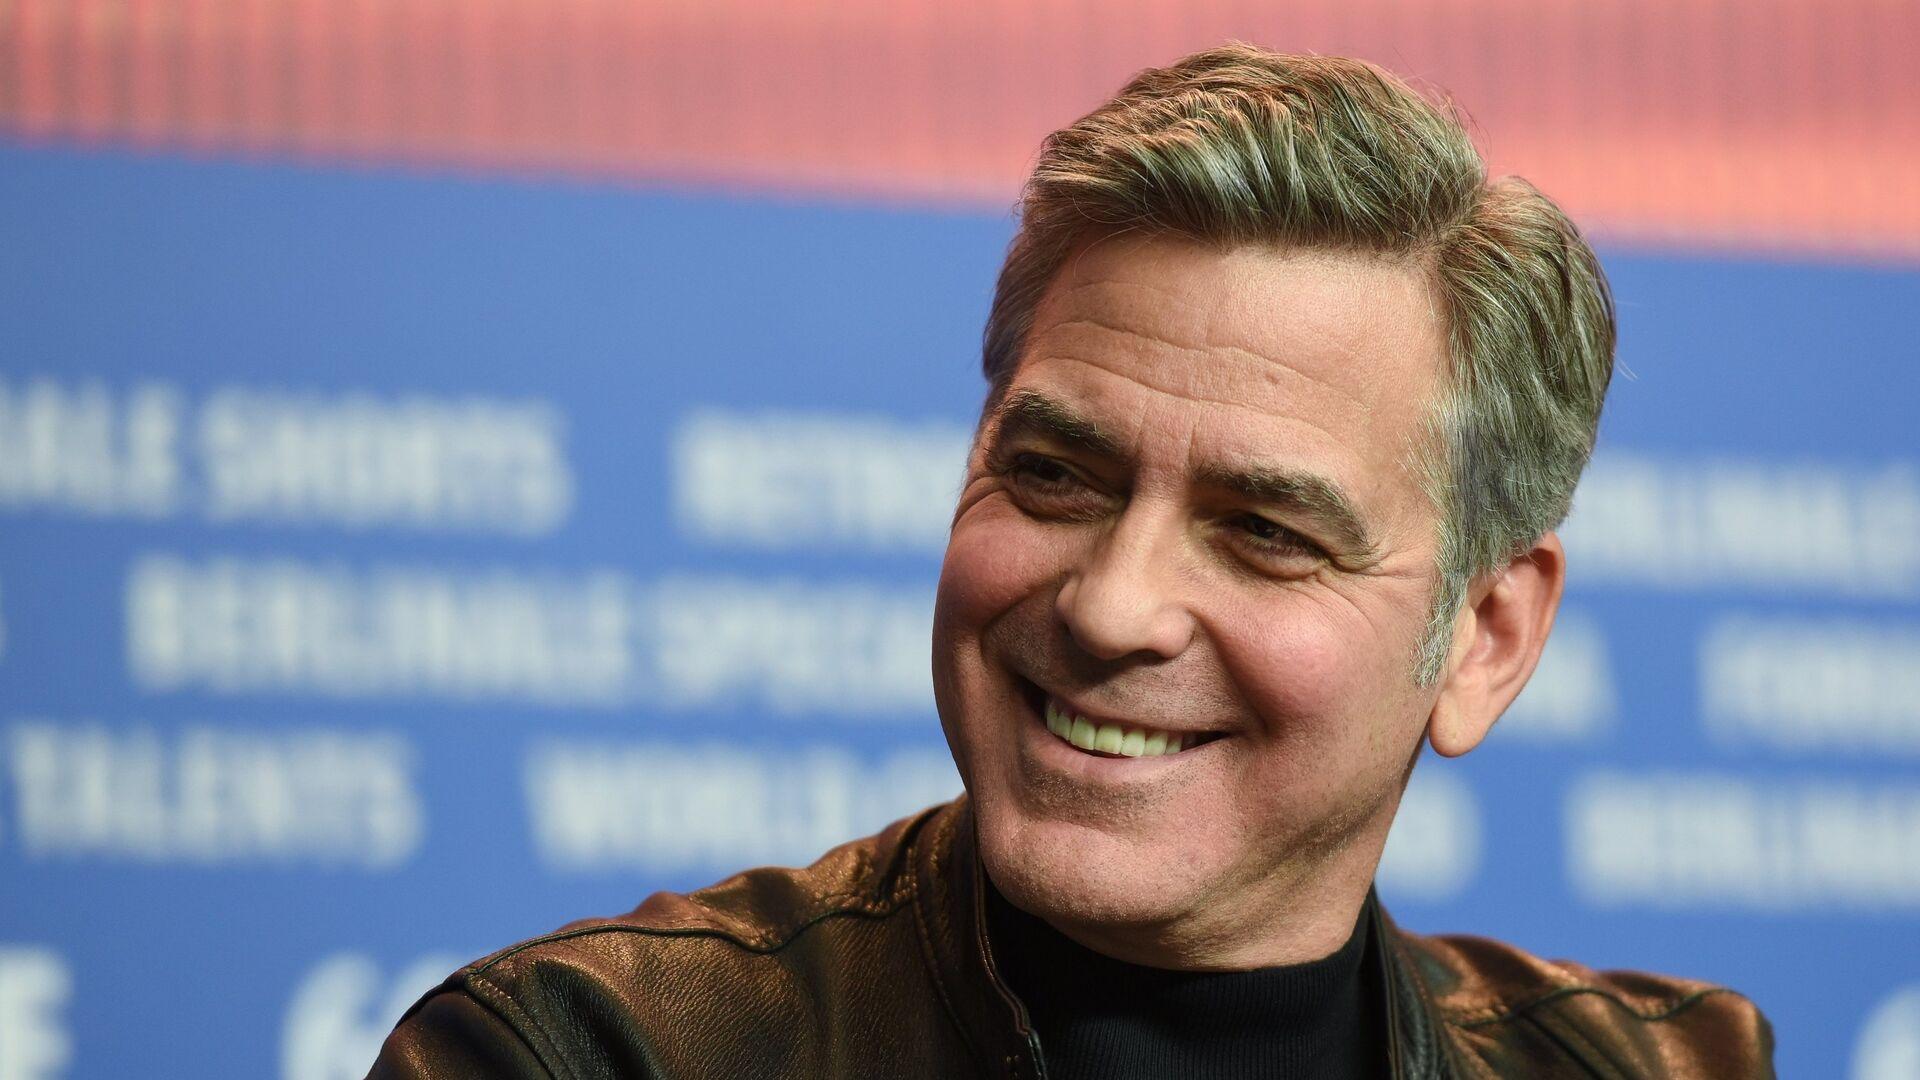 Актер Джордж Клуни - РИА Новости, 1920, 16.10.2020